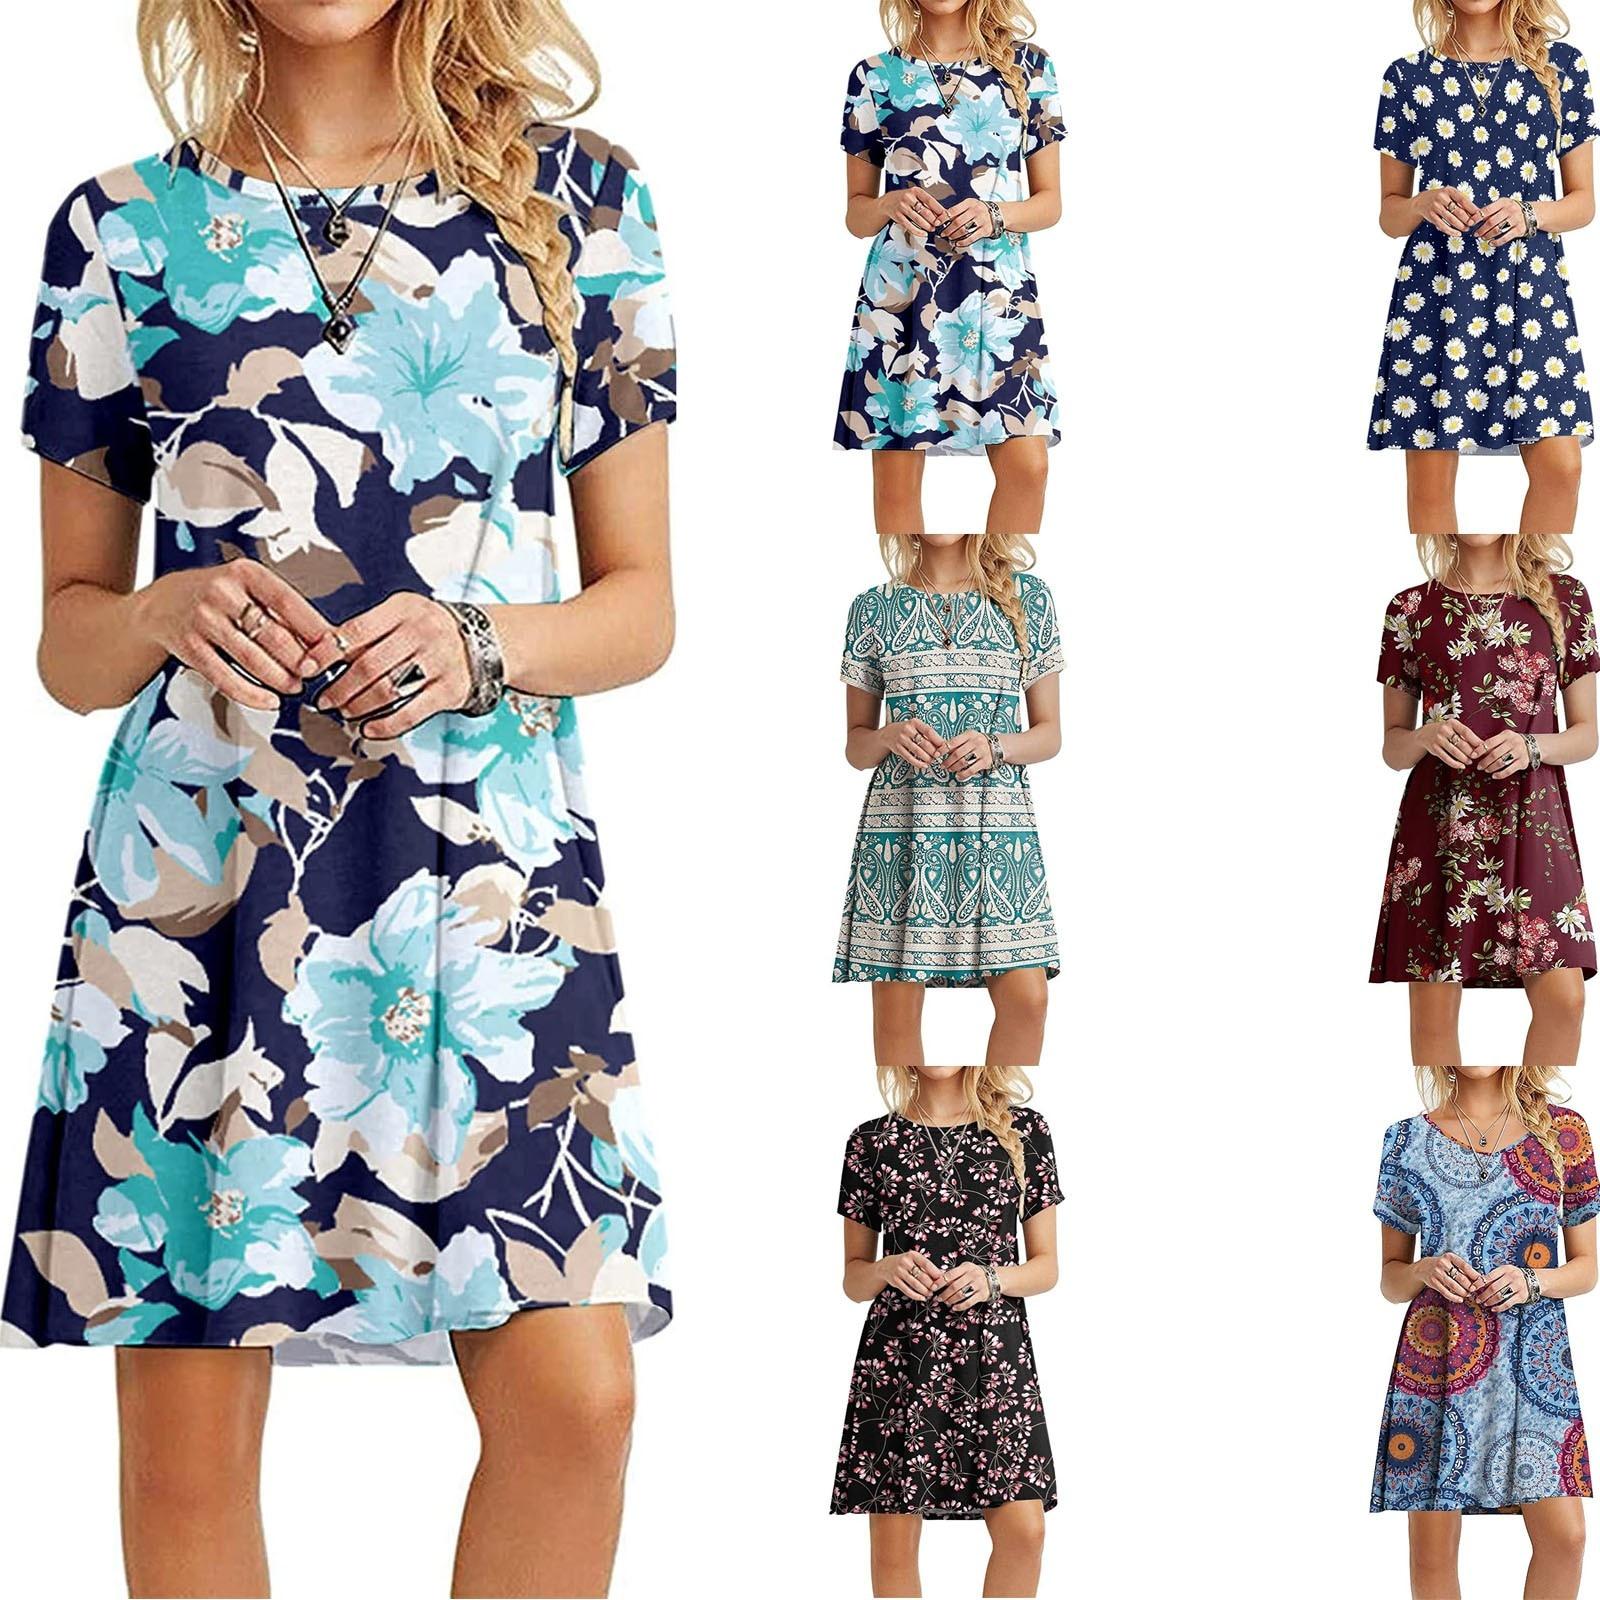 Women's Summer Casual Tshirt Dresses Short Sleeve Boho Beach Dress 1